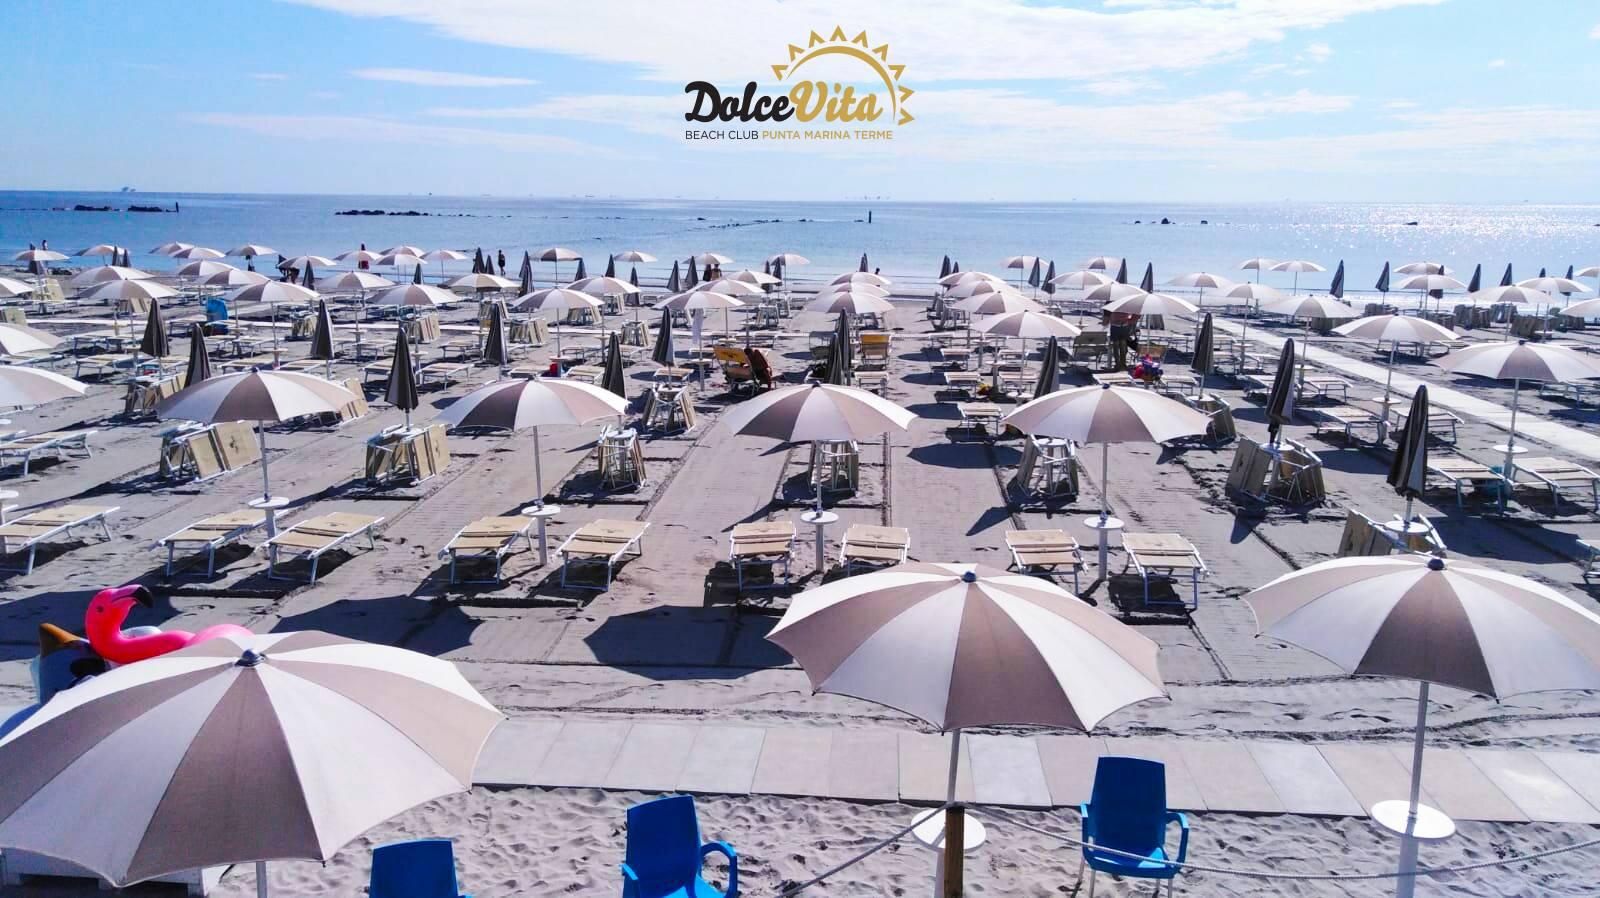 Dolcevita Punta Marina Relax